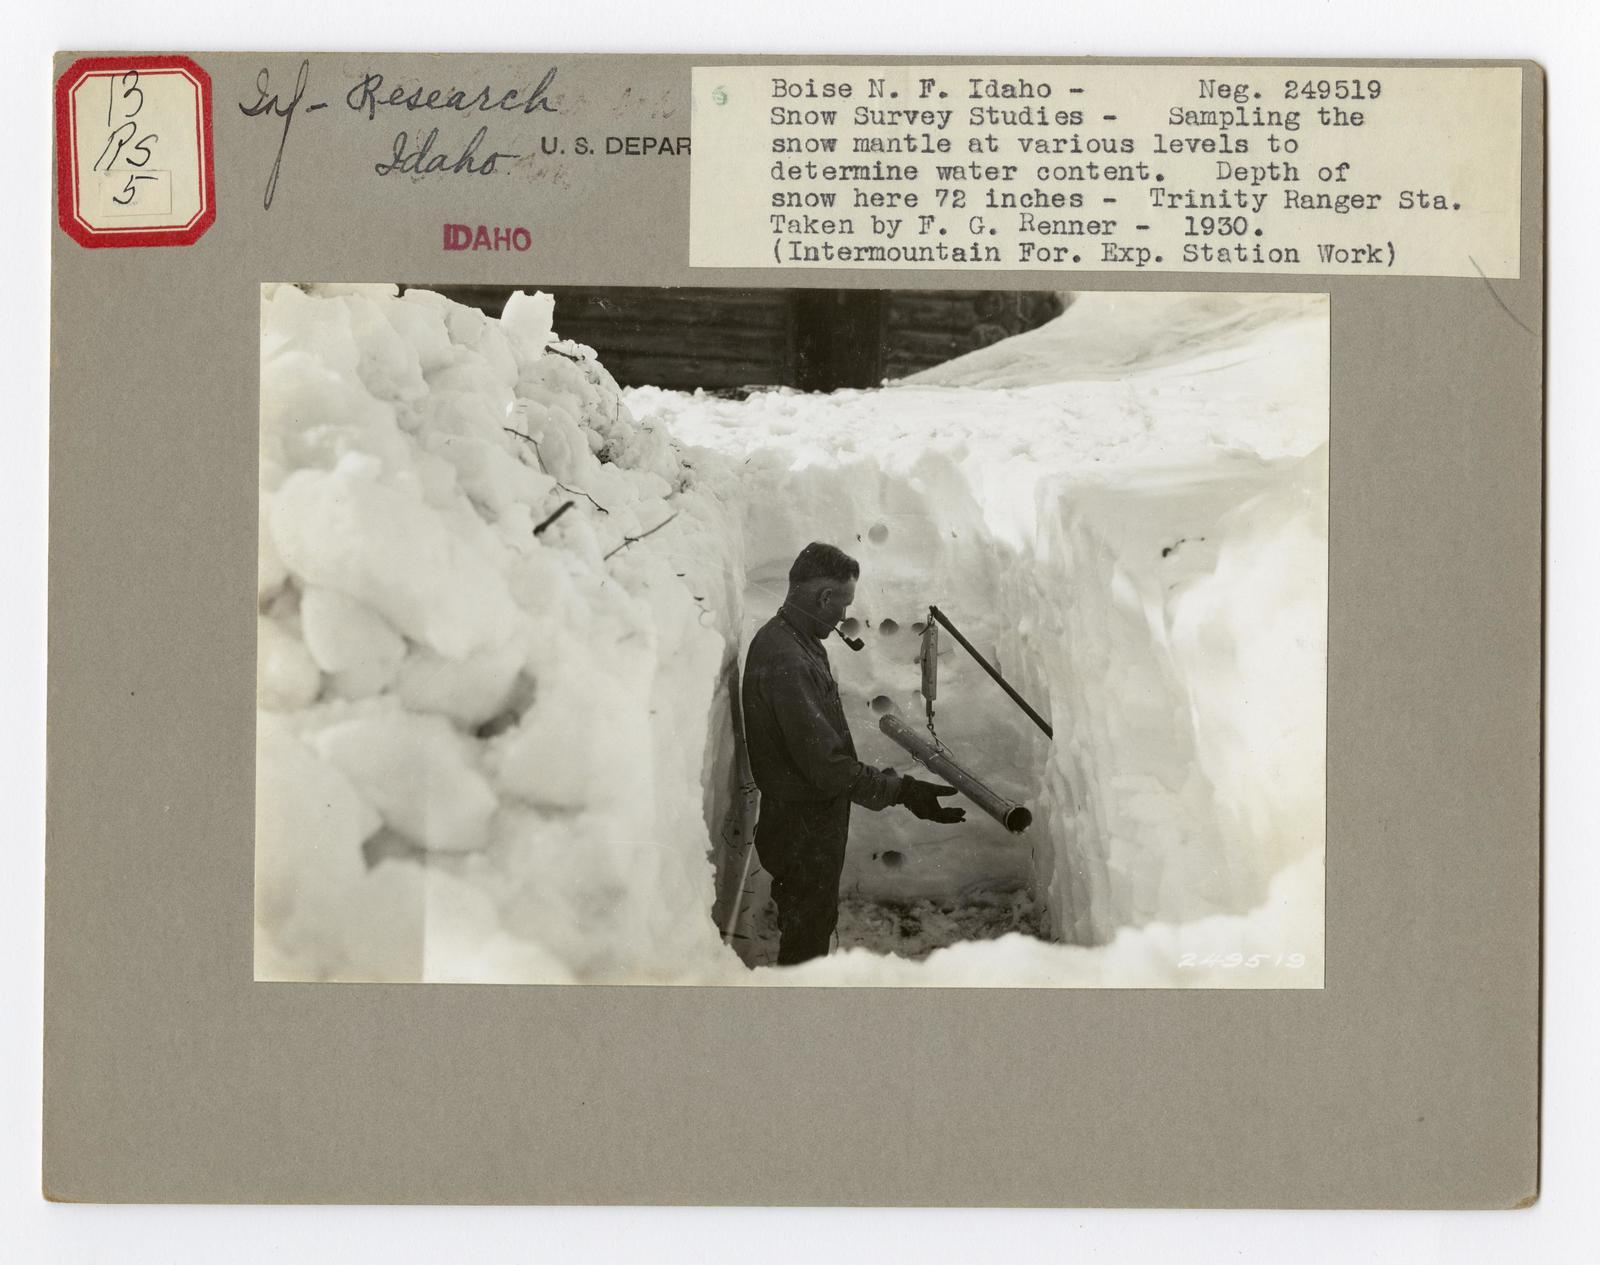 Instrumentation: Climatic - Idaho